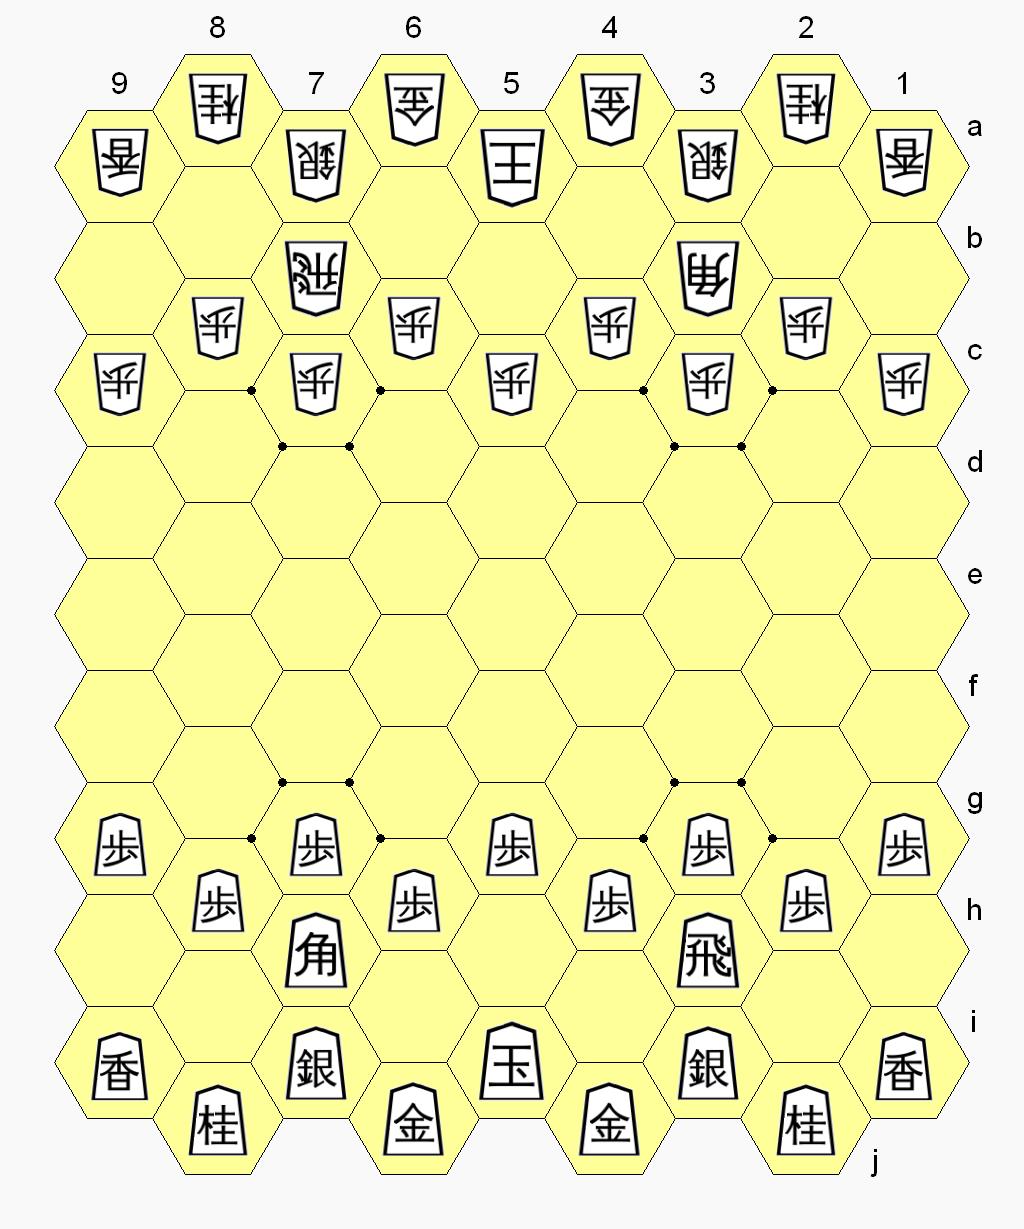 Hexshogi Wikipedia Move Checkmate Diagram Furthermore Chess Moves In Addition The Event